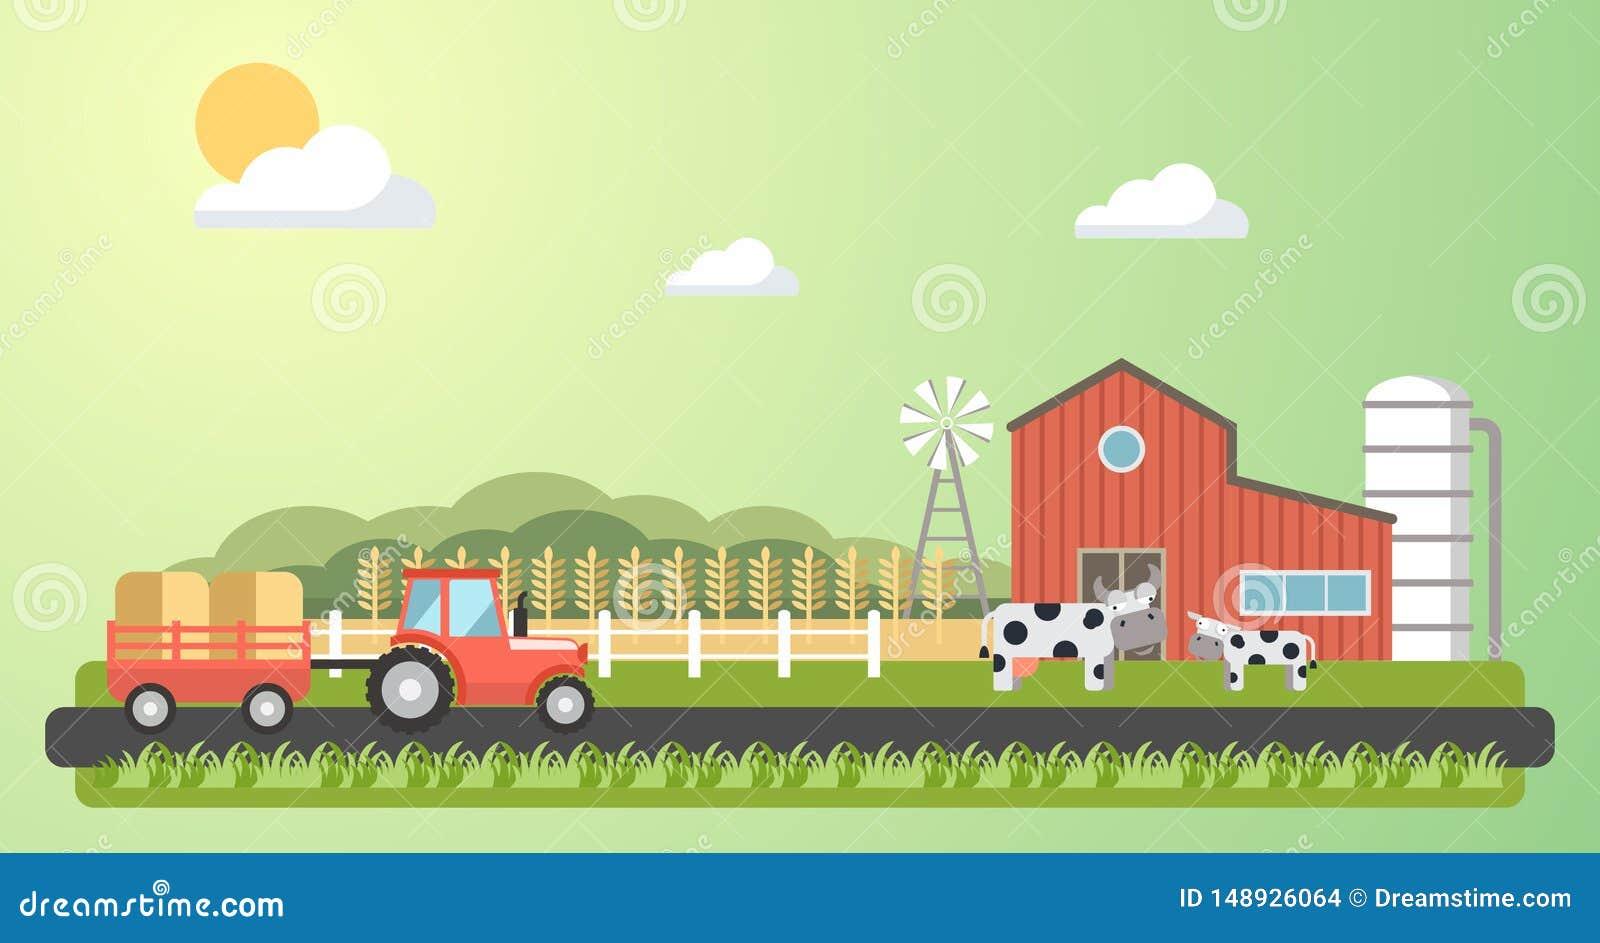 Farm Village landscape illustration